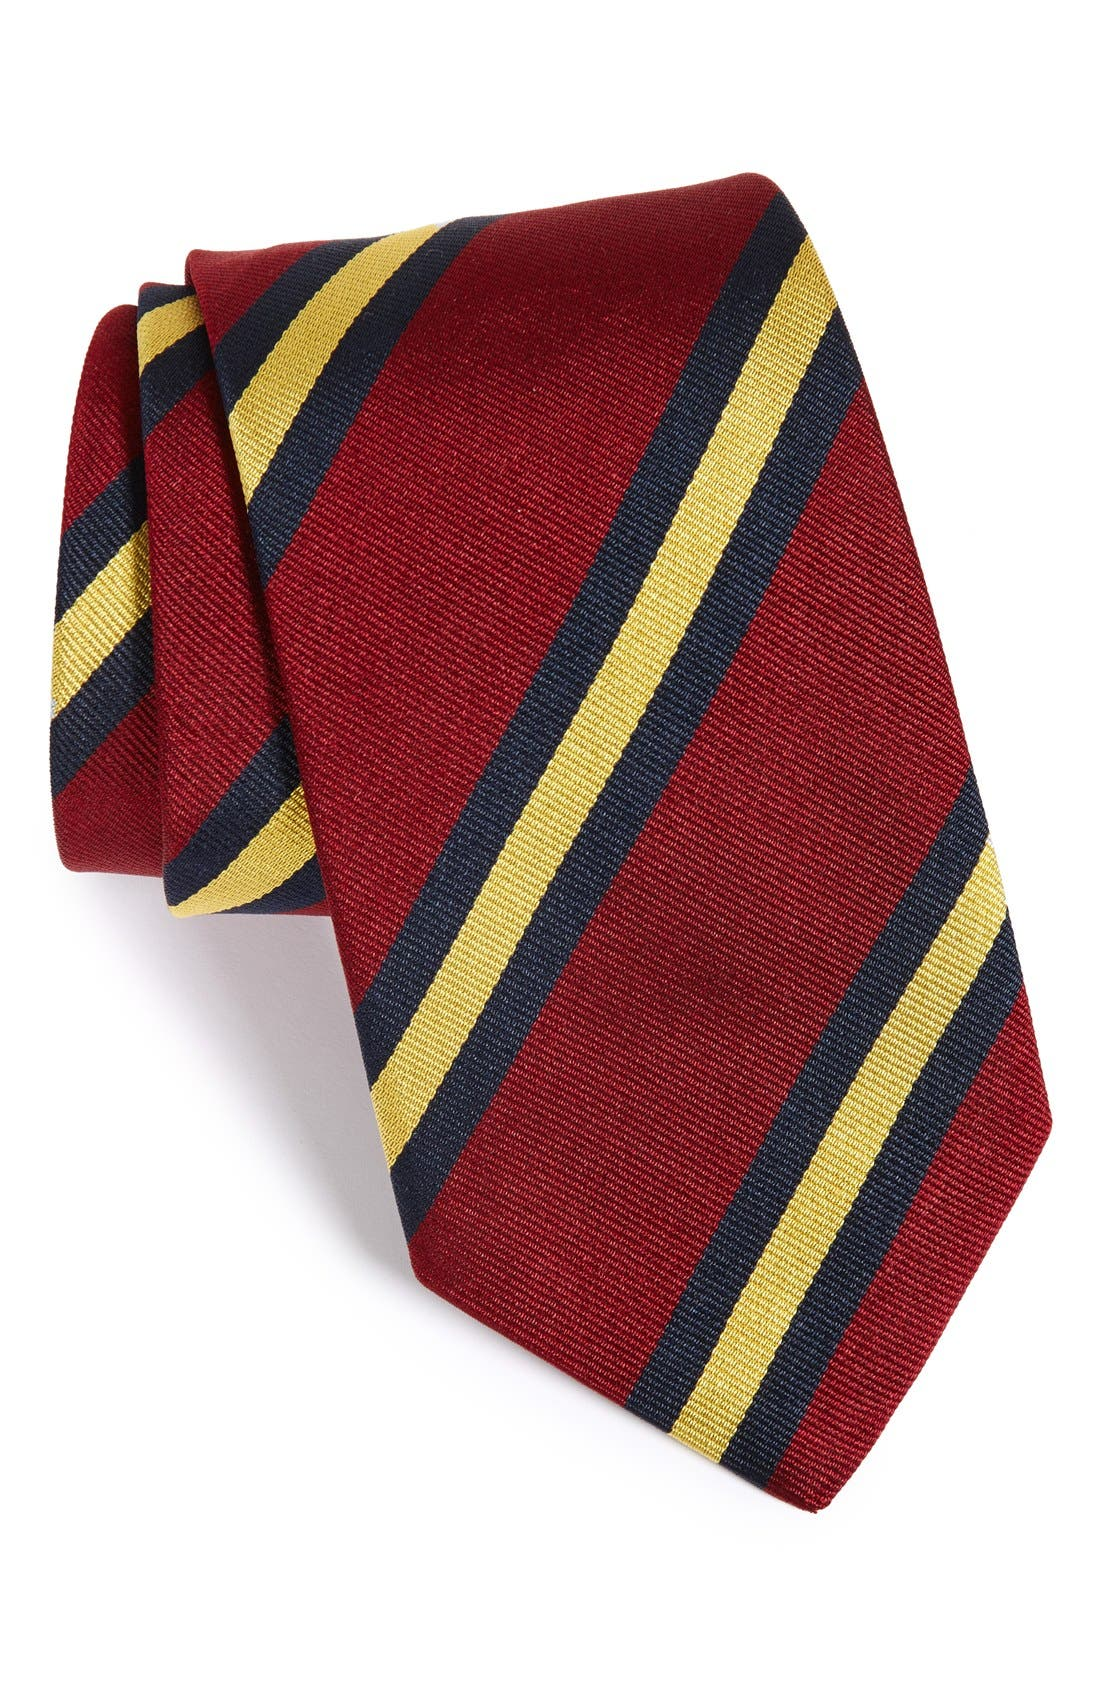 StripeSilk Tie,                             Main thumbnail 1, color,                             930